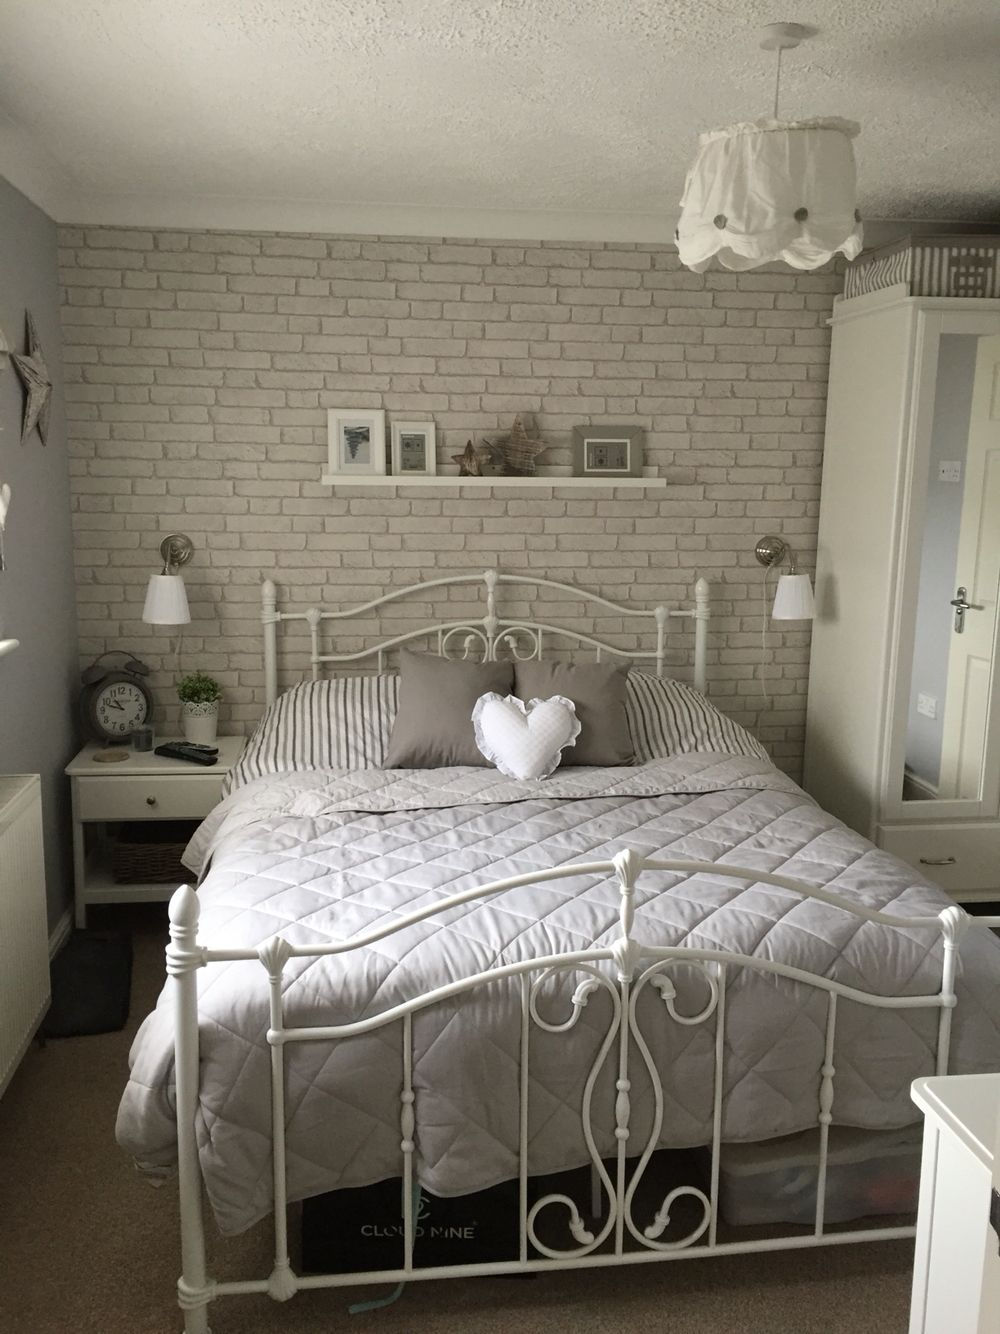 Grey Brick Wallpaper In Bedroom 1000x1334 Wallpaper Teahub Io